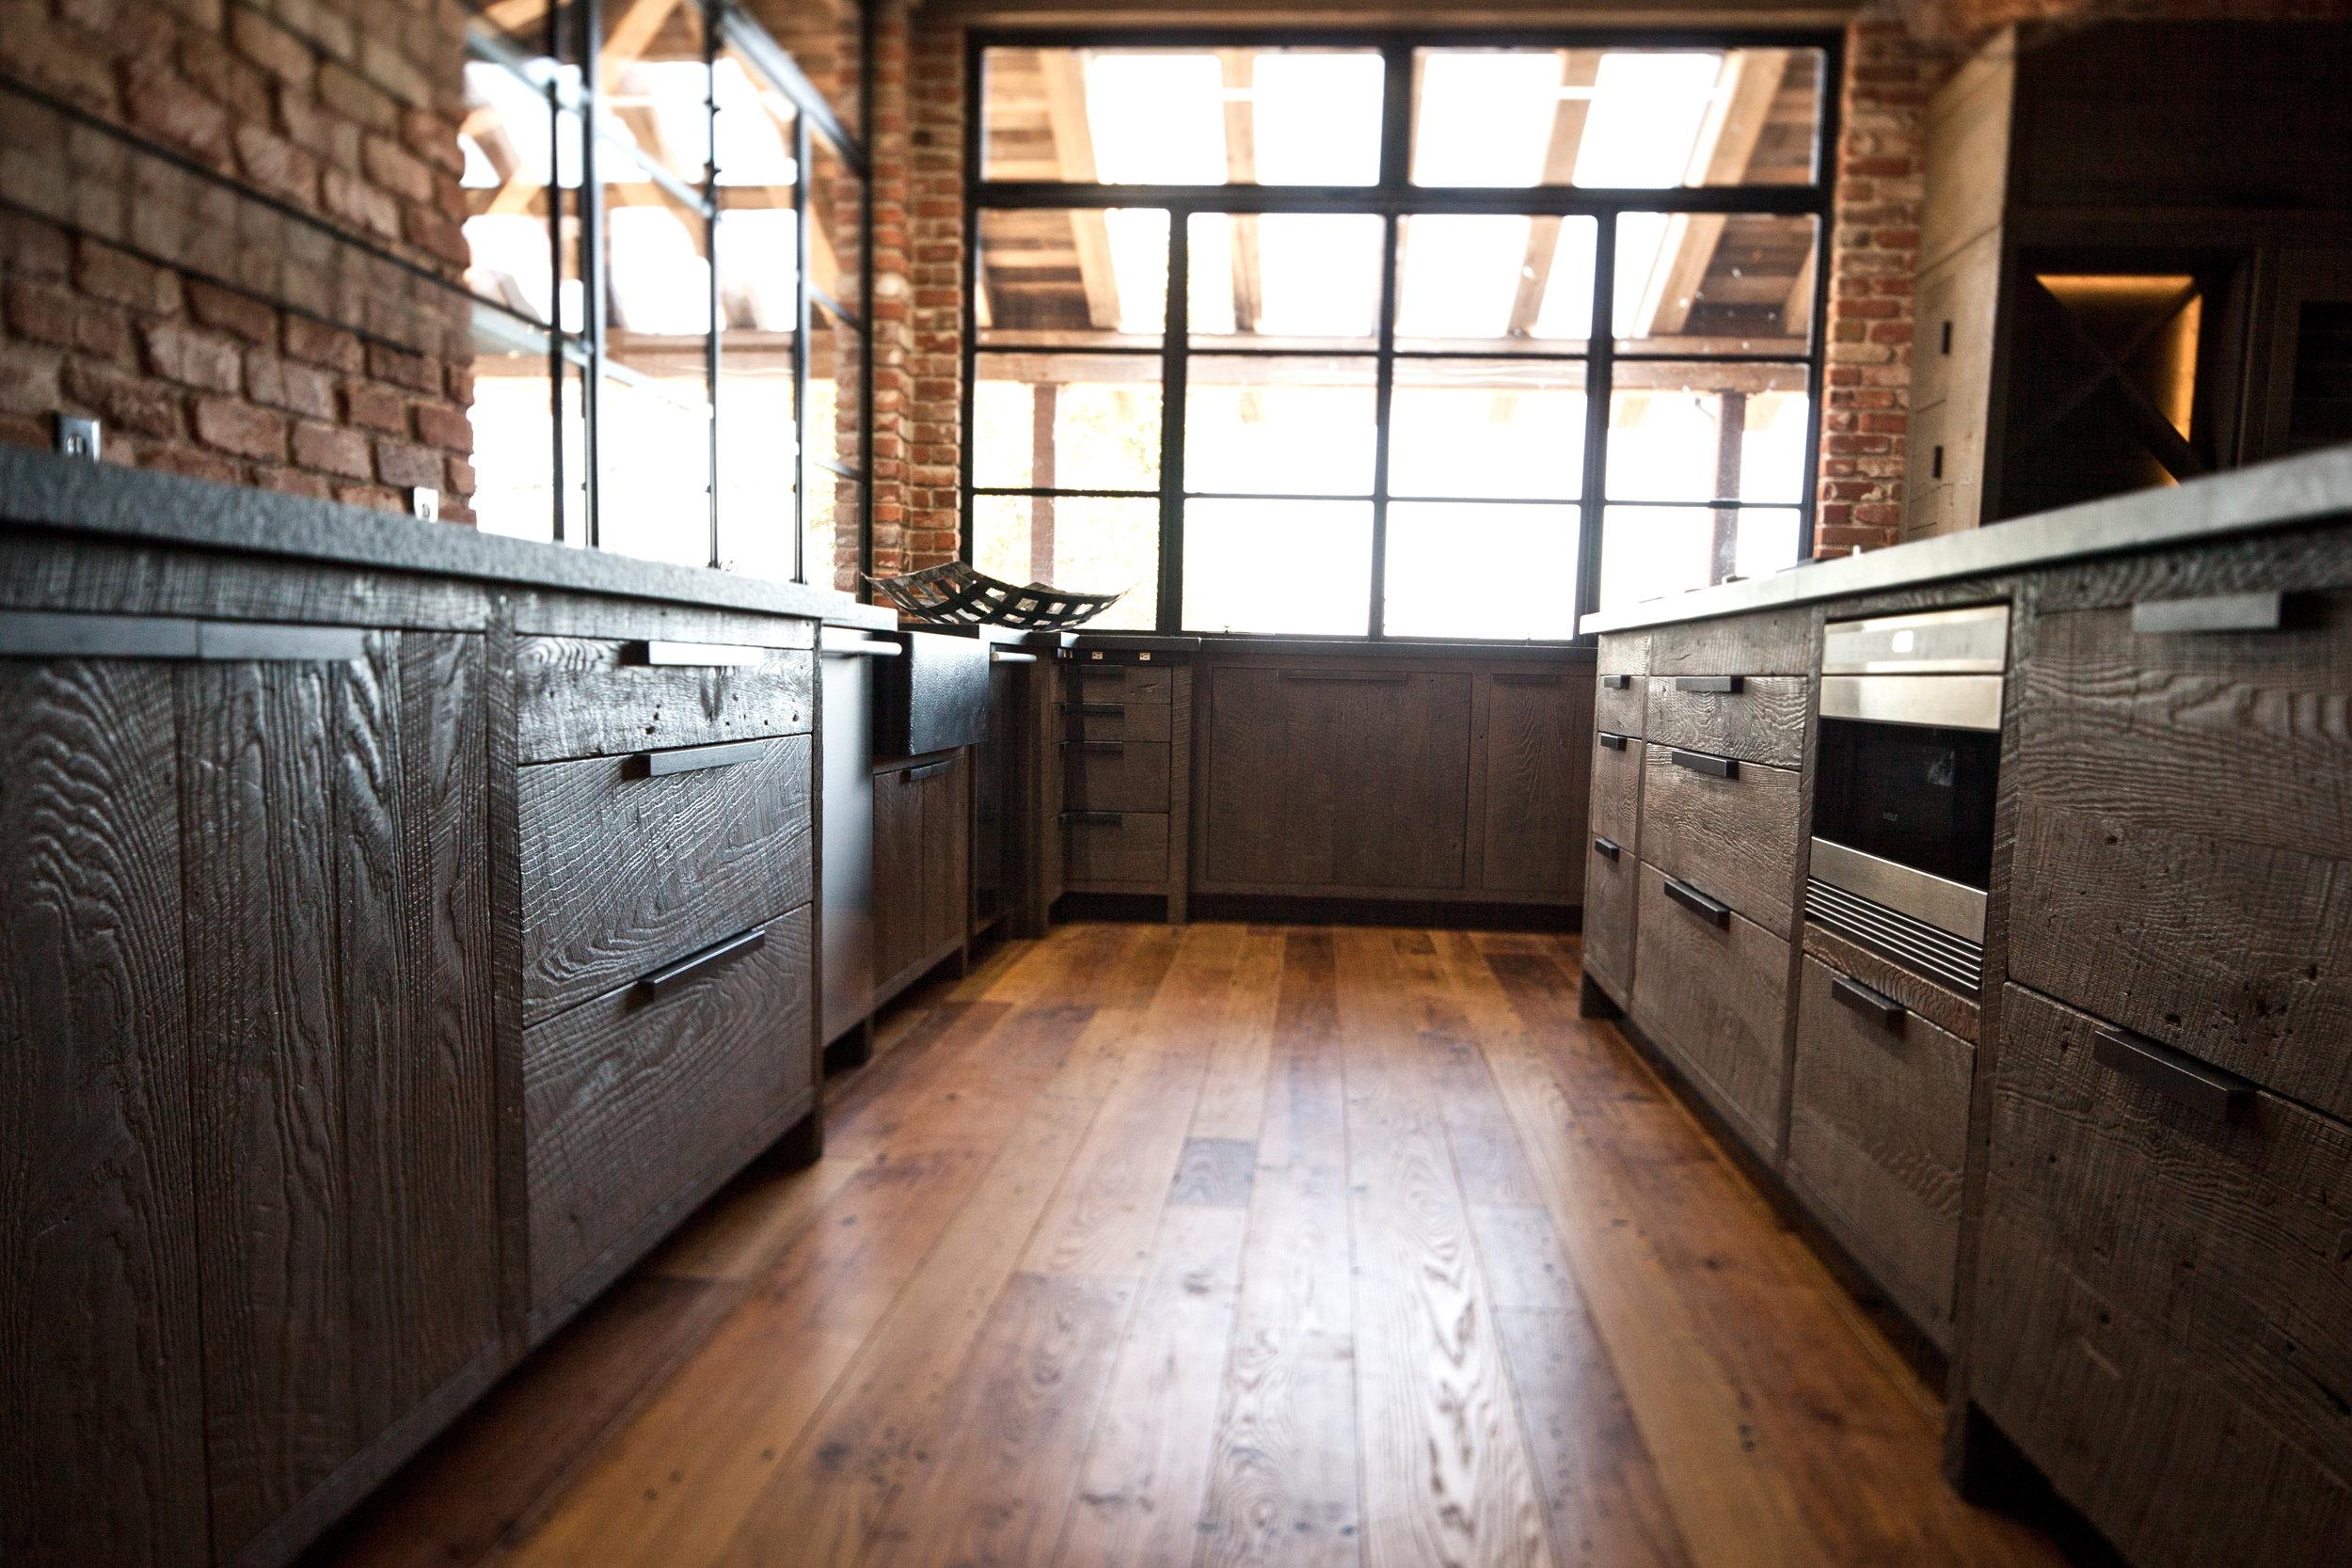 ben-riddering-rustic-modern-kitchen-1.jpg